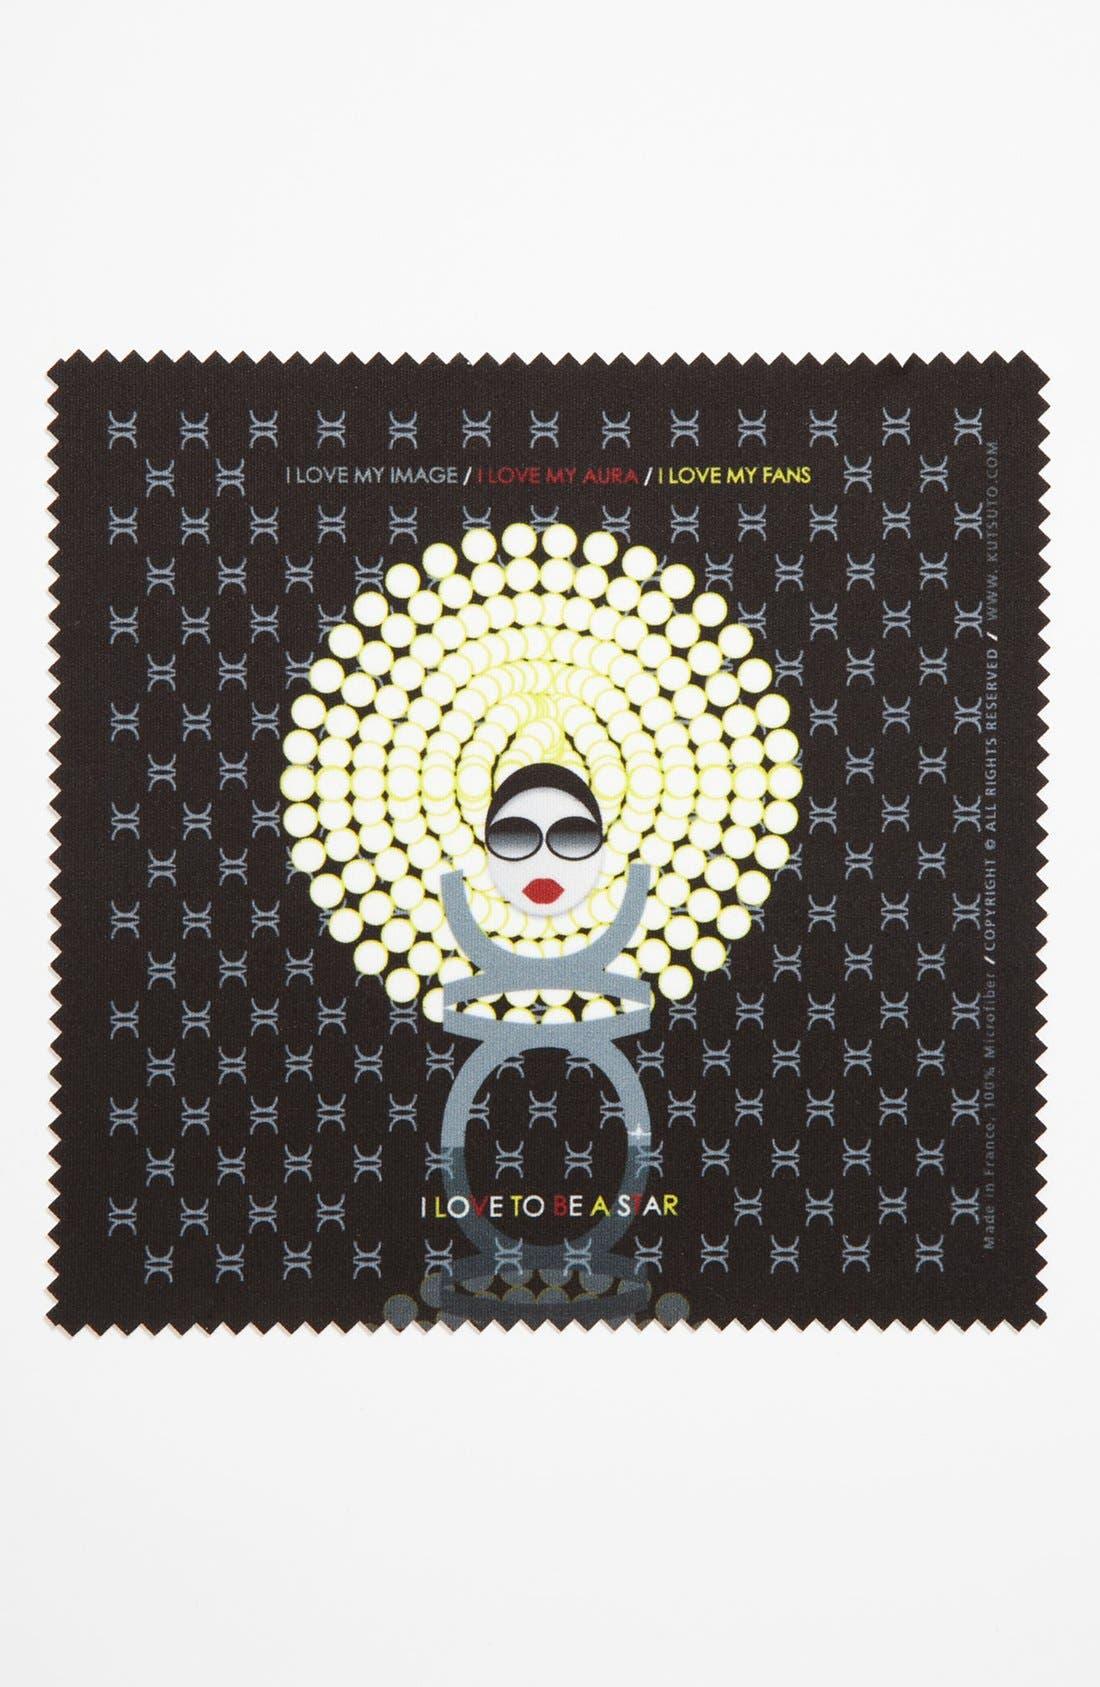 Alternate Image 1 Selected - KUTSUTO 'Kutsinette - I Love To Be A Star' Microfiber Cloth